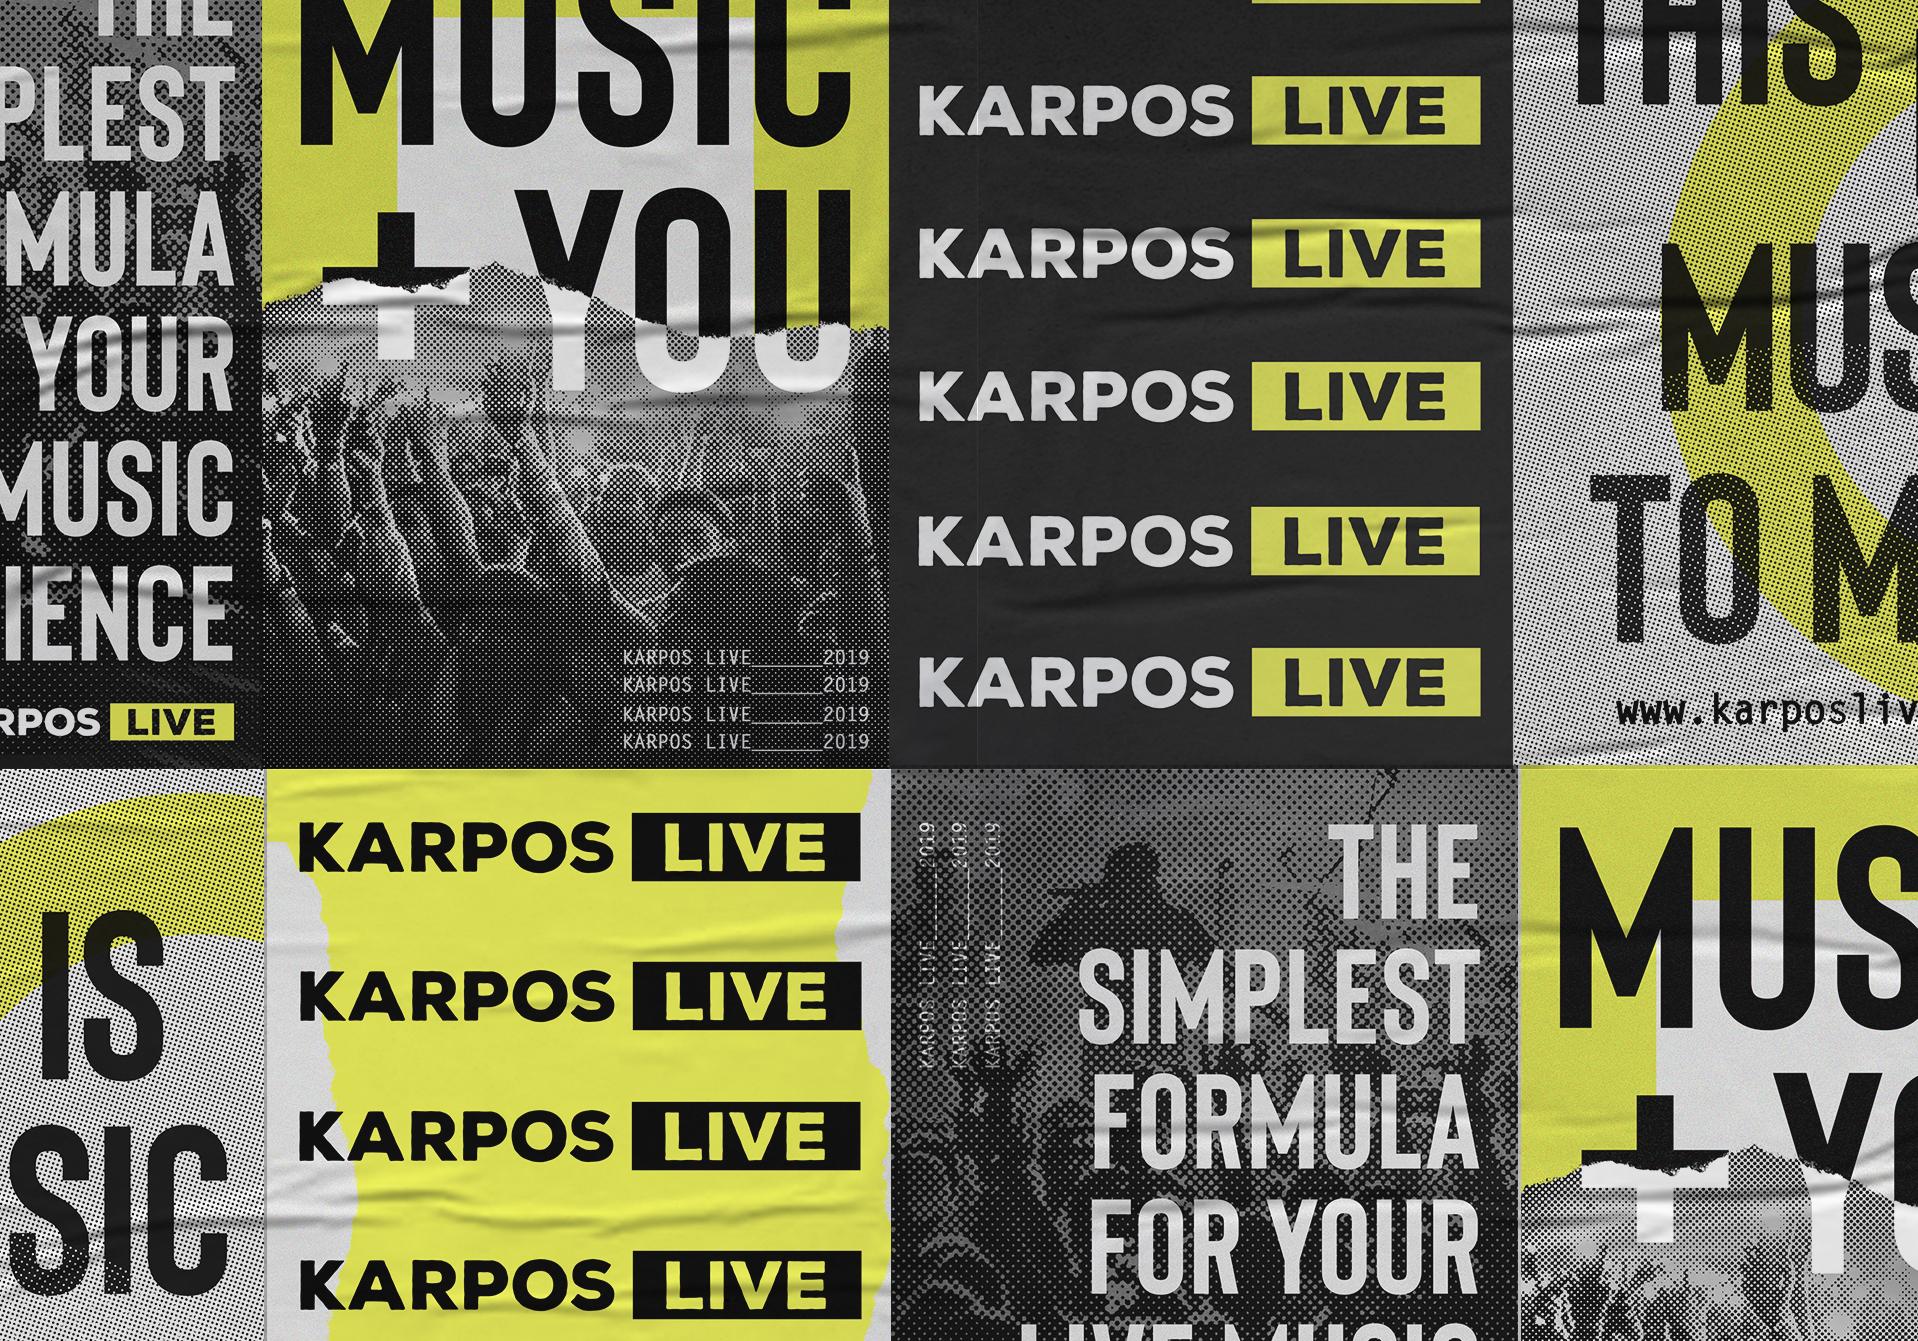 Karpos Live – Music + You